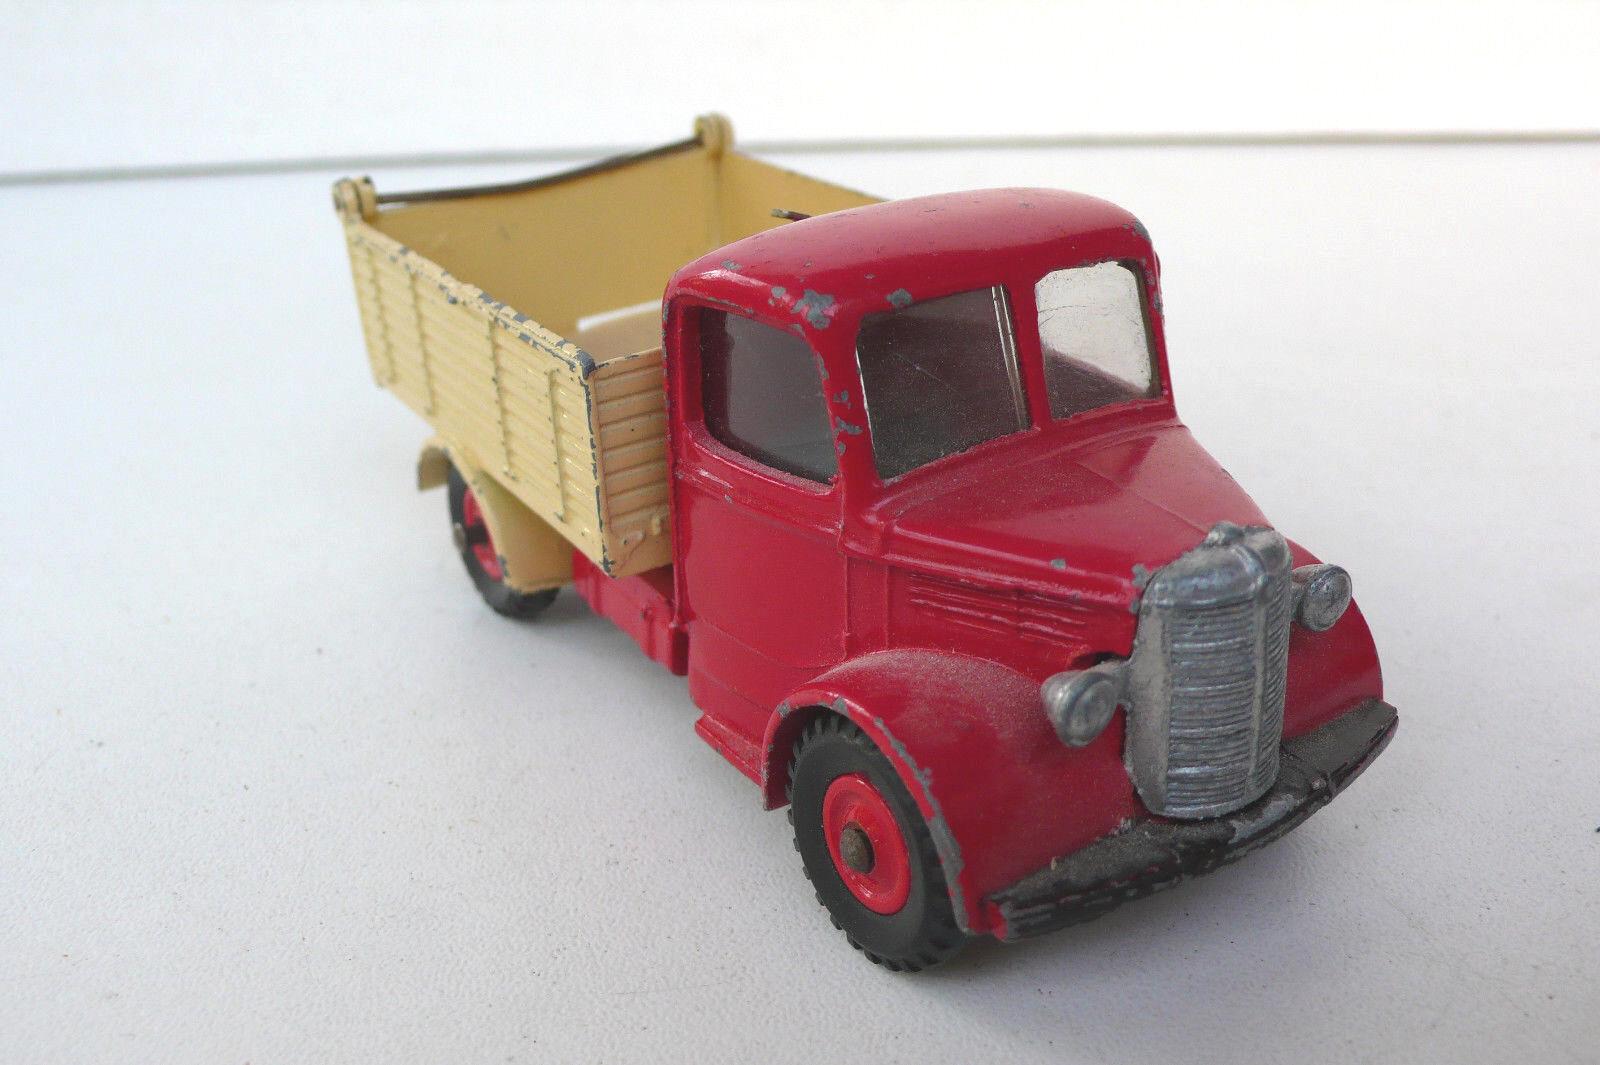 grandi offerte DINKY giocattoli ENGLe  CAMION  BEDFORD BEDFORD BEDFORD BENNE RELEVABLE REF 25 M 1948  54 BON ÉTAT  senza esitazione! acquista ora!